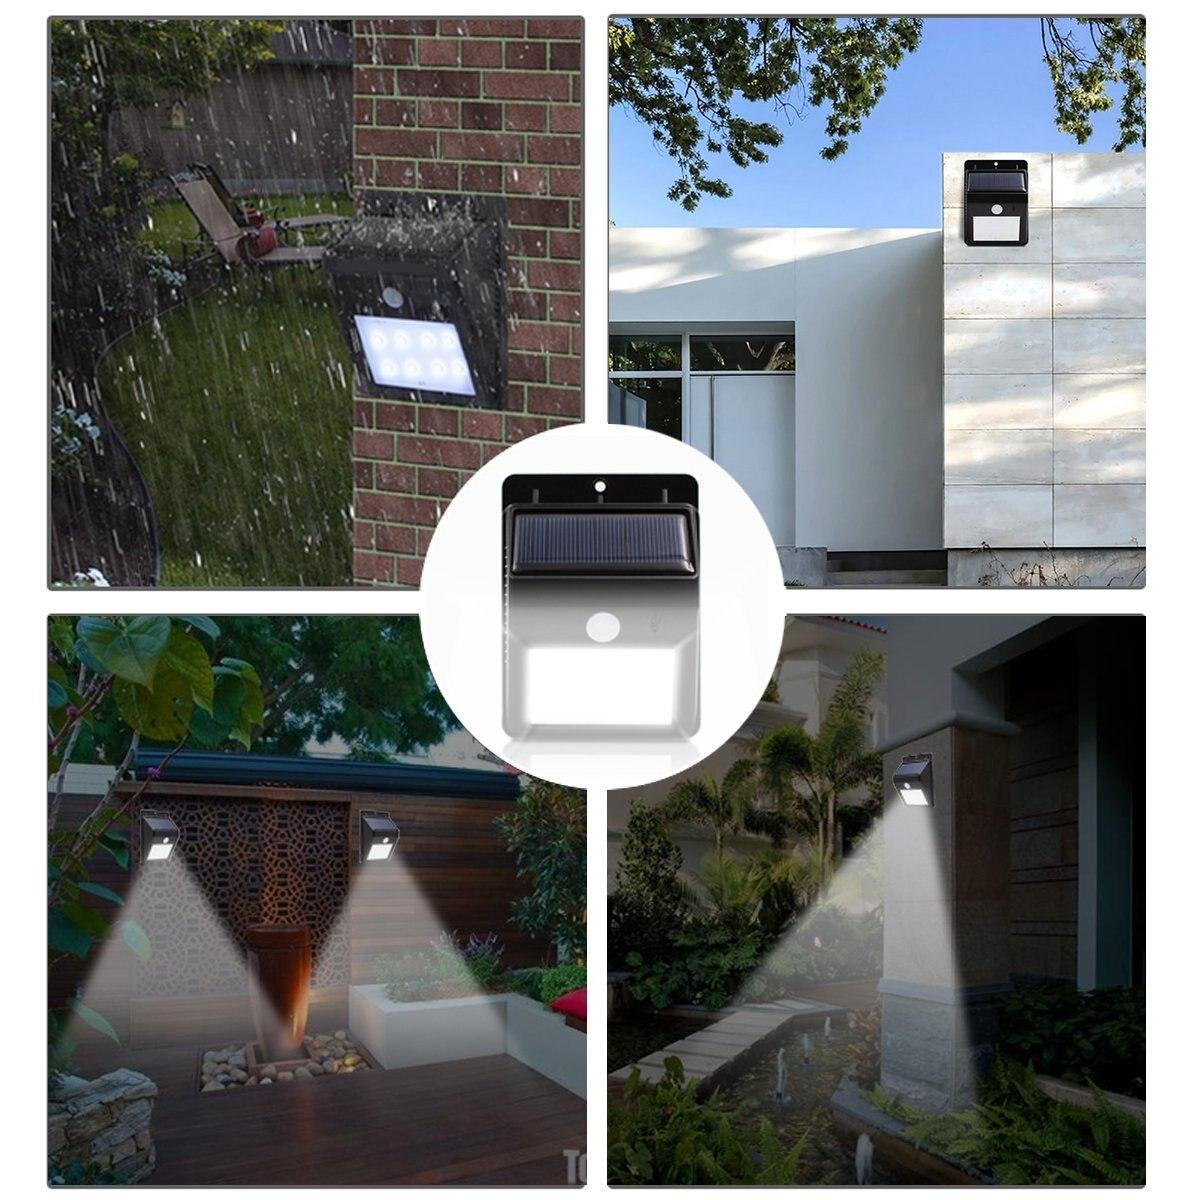 Lâmpadas Solares lâmpadas luminaria energia solar 8 Features : Waterproof